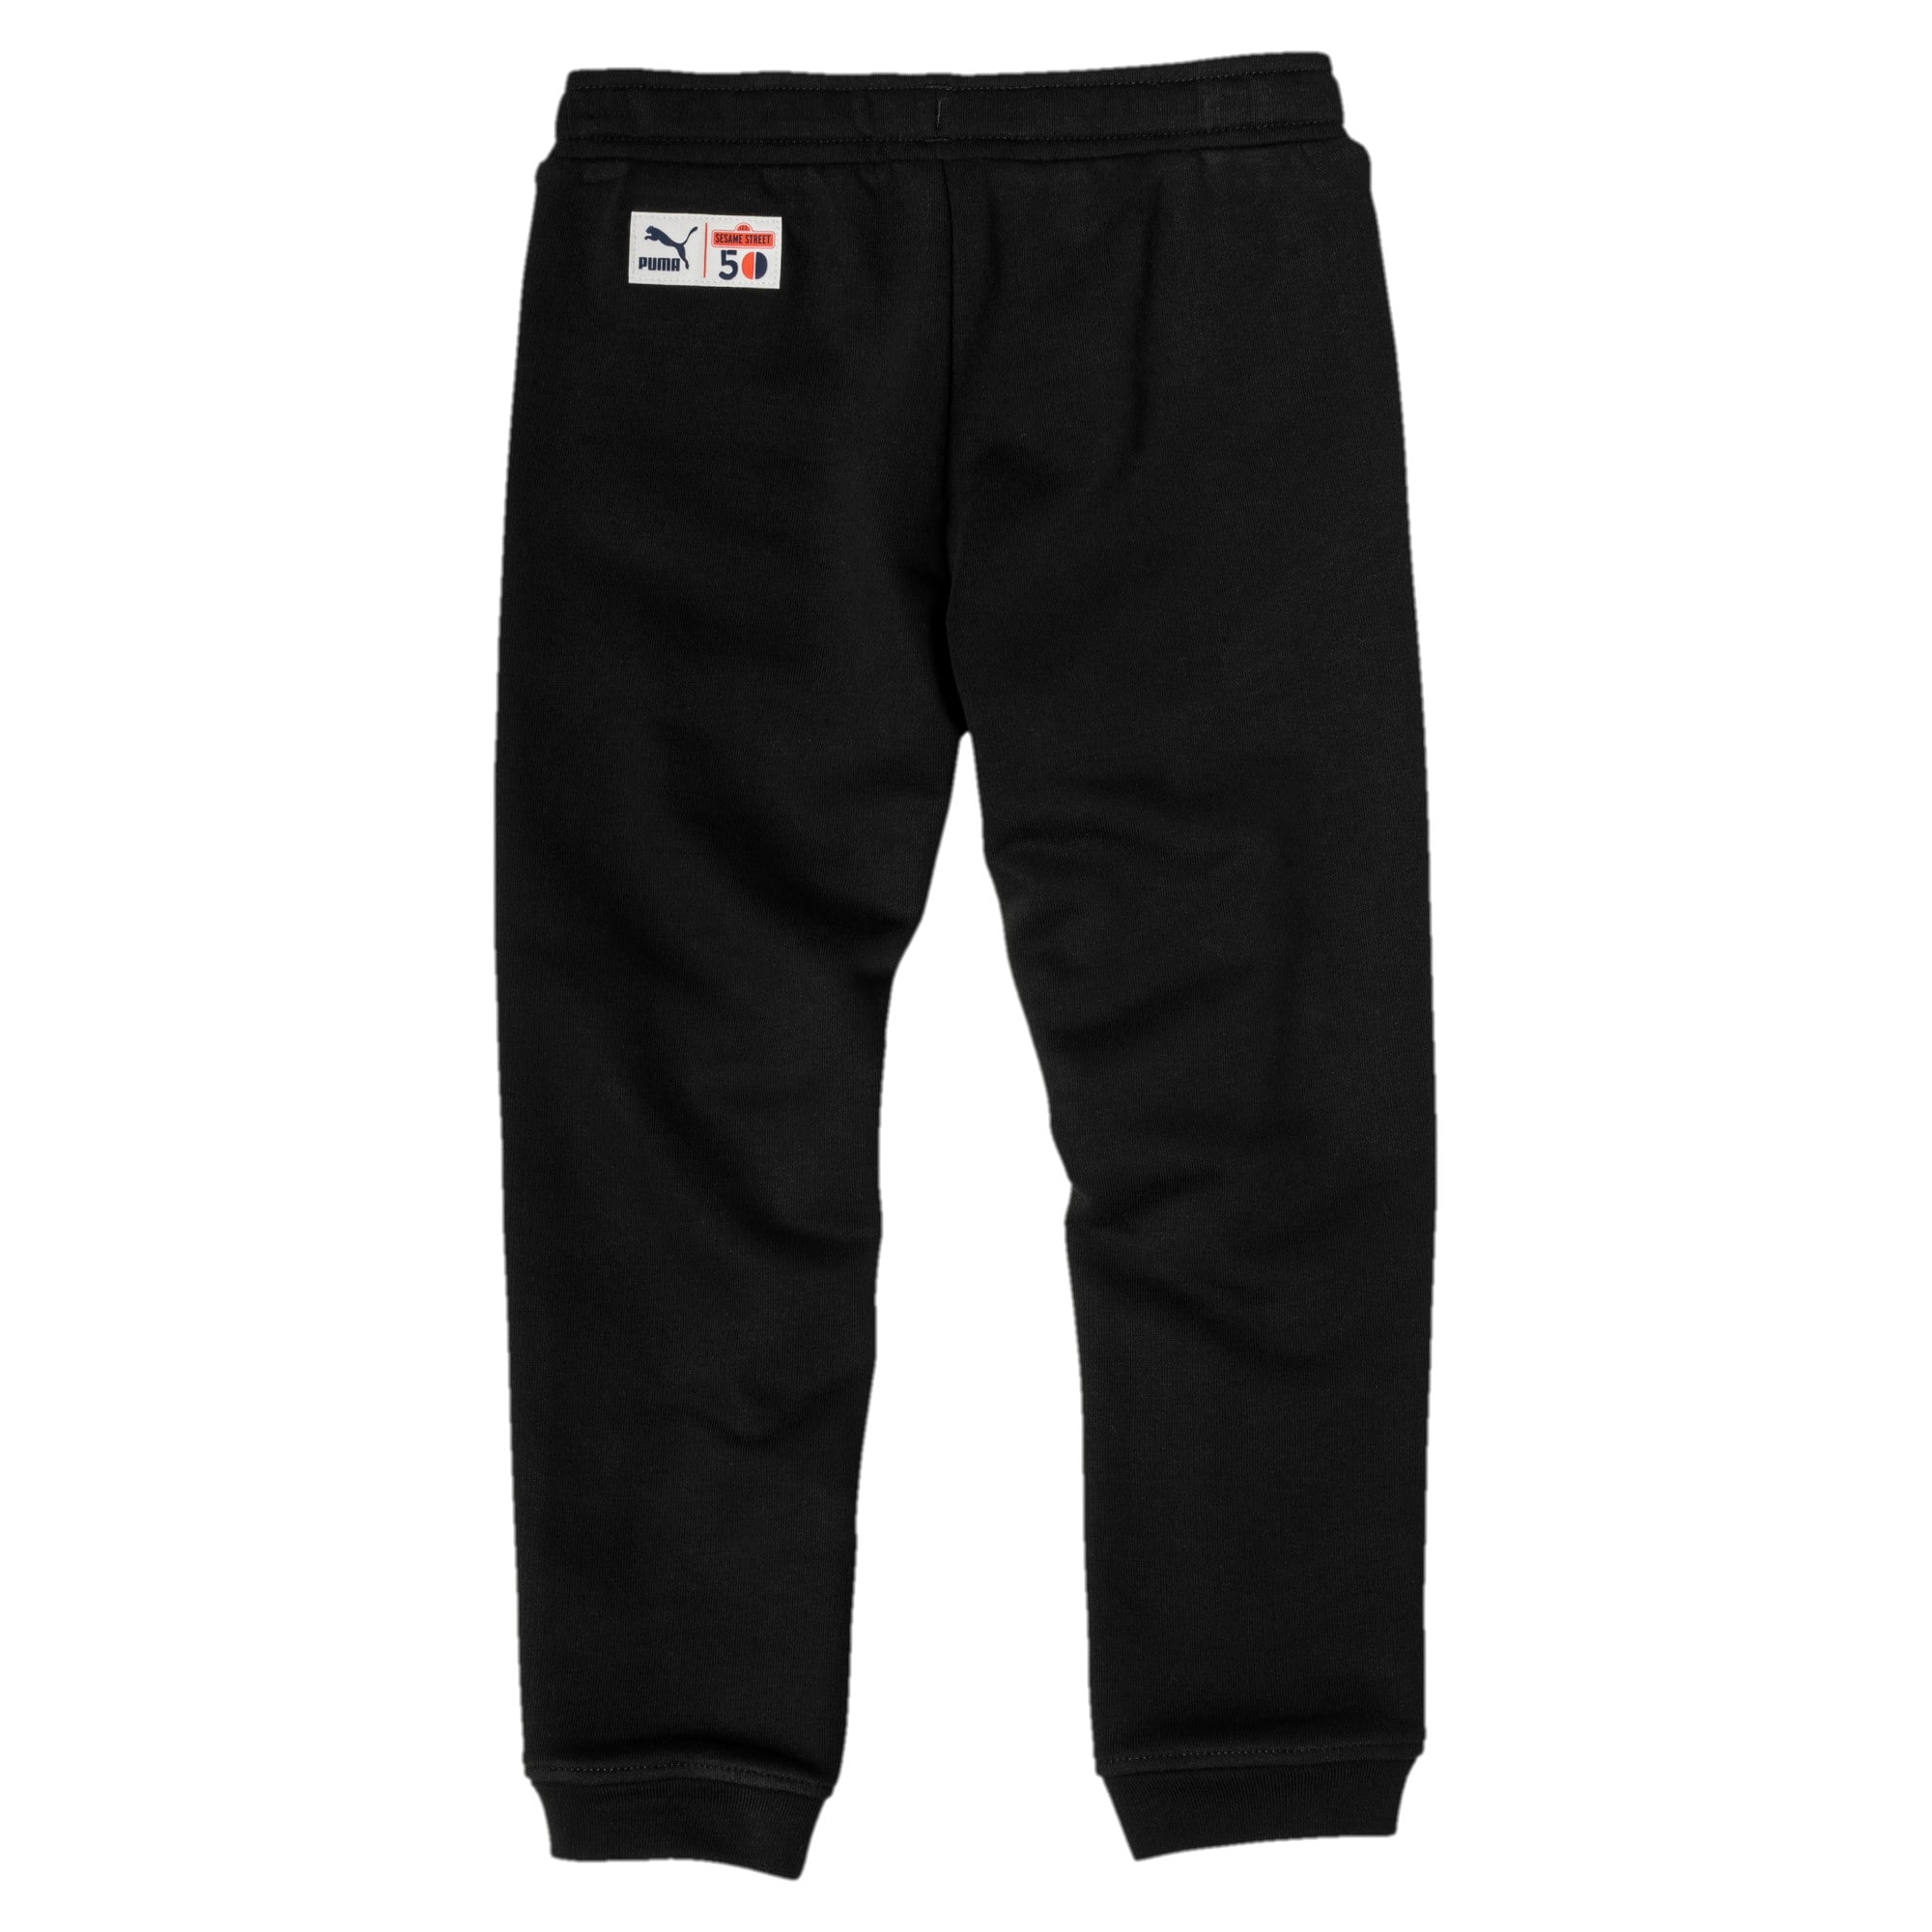 Thumbnail 2 of PUMA x SESAME STREET Boy's Sweatpants, Cotton Black, medium